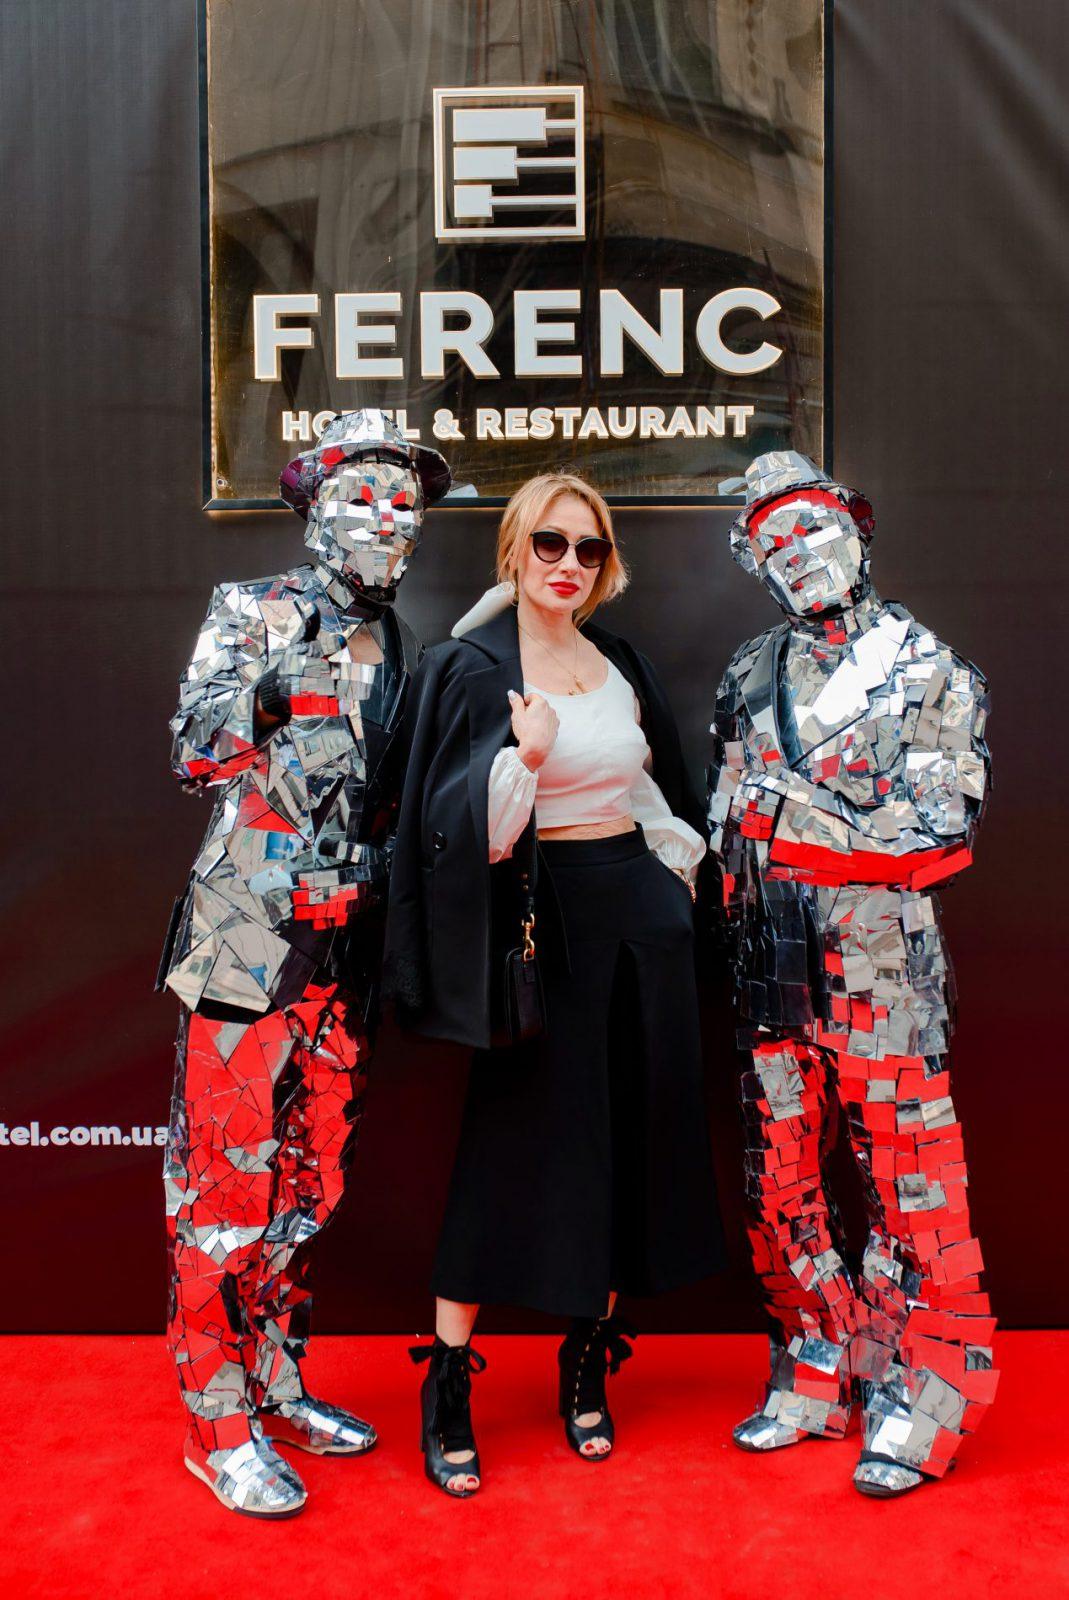 Ferenc0156